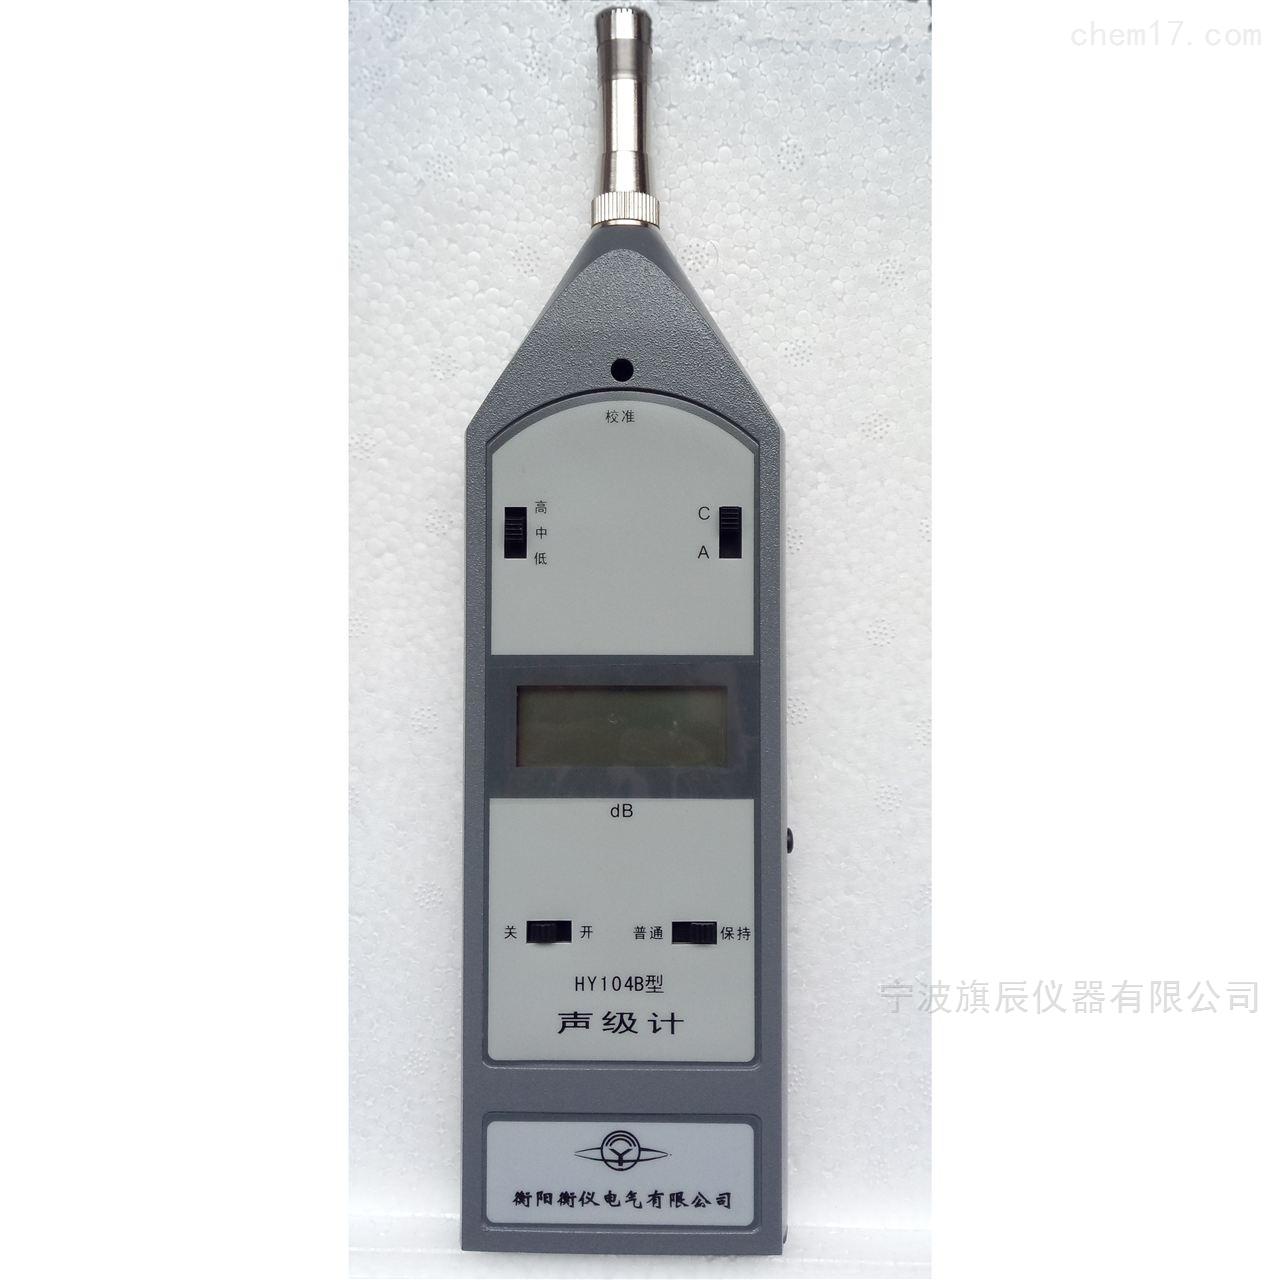 HY104B型手持式声级计